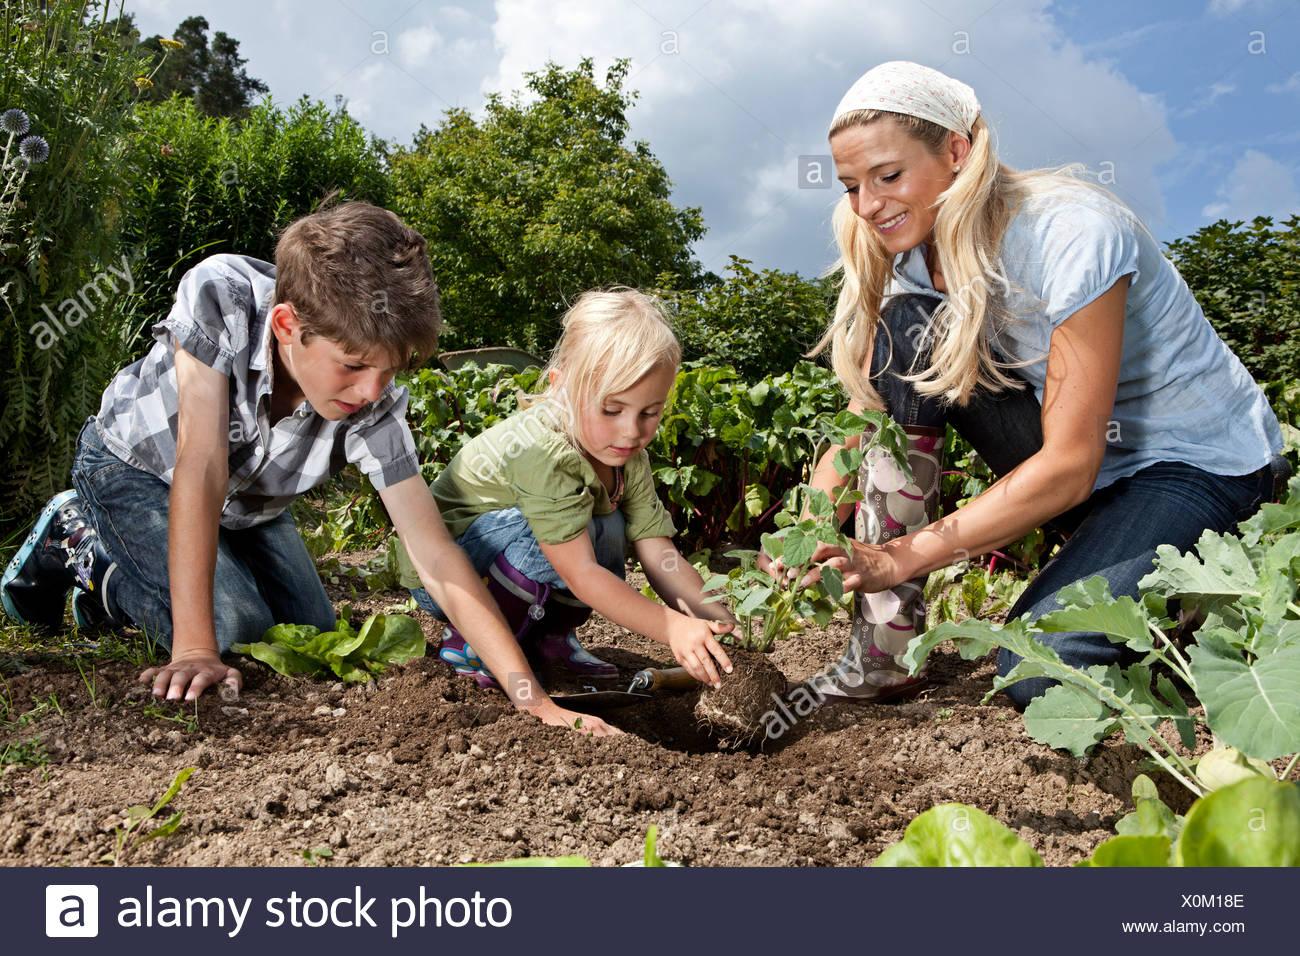 Germany, Bavaria, Altenthann, Woman and children gardening together in garden Stock Photo